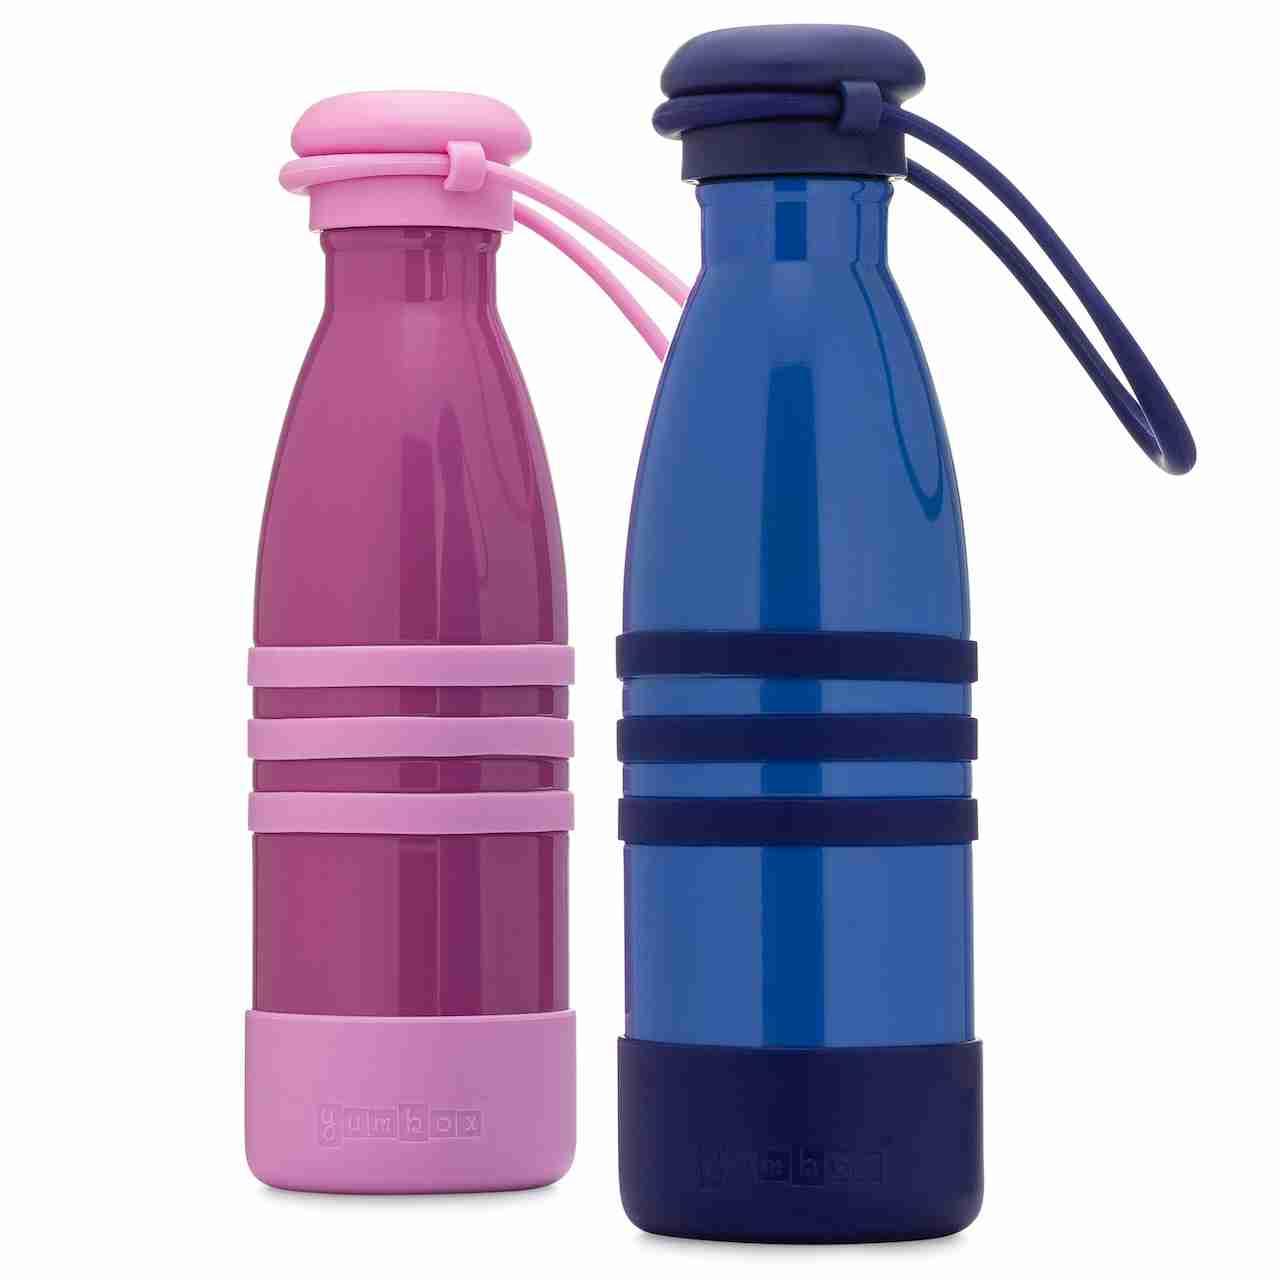 Yumbox - Aqua Insulated Drink Bottle - Stack